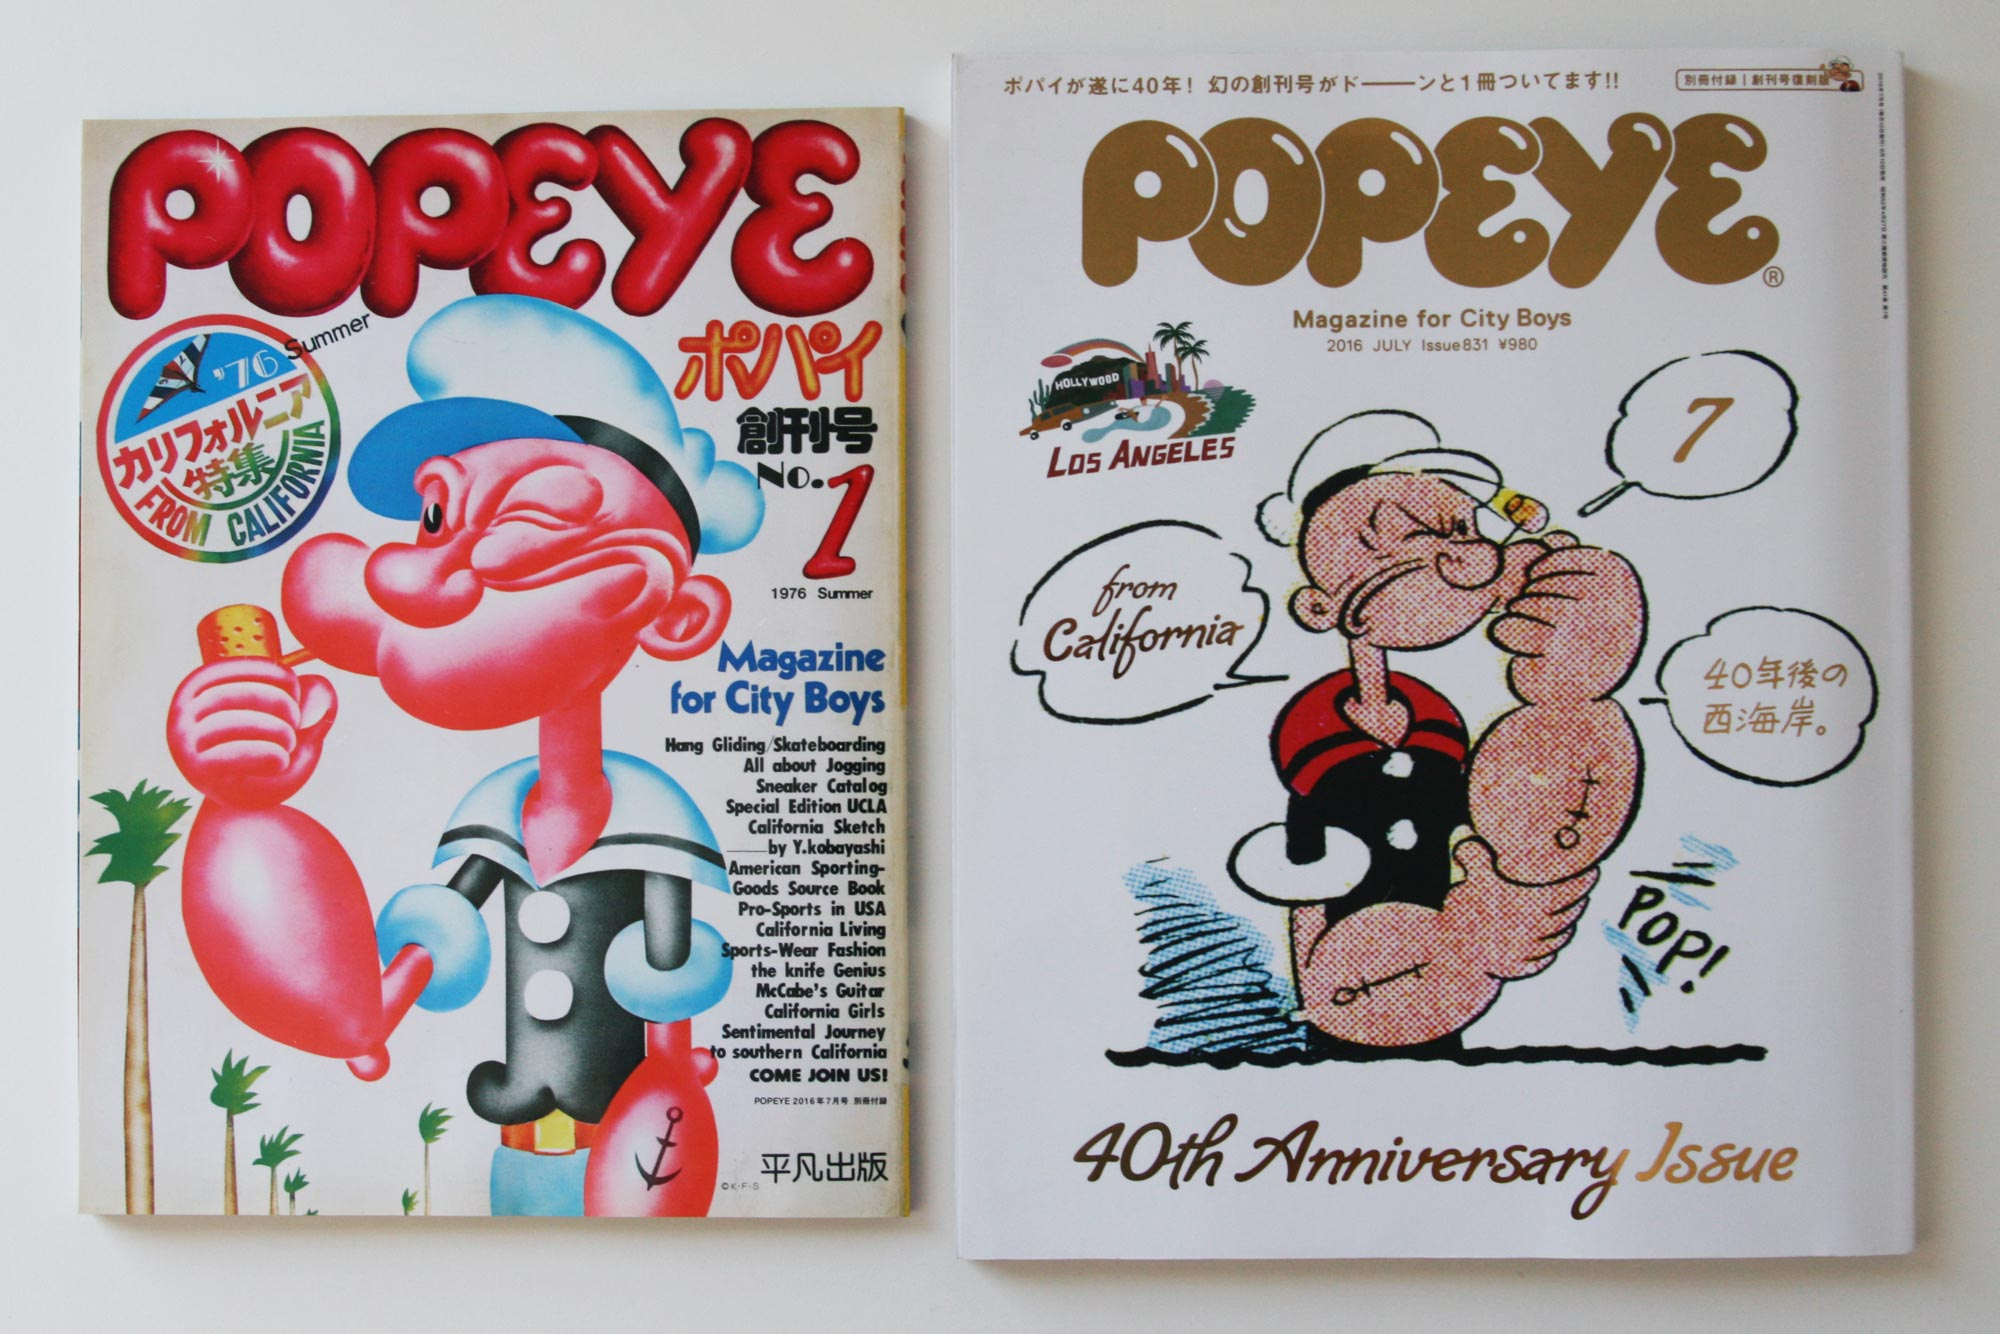 popeye_4507